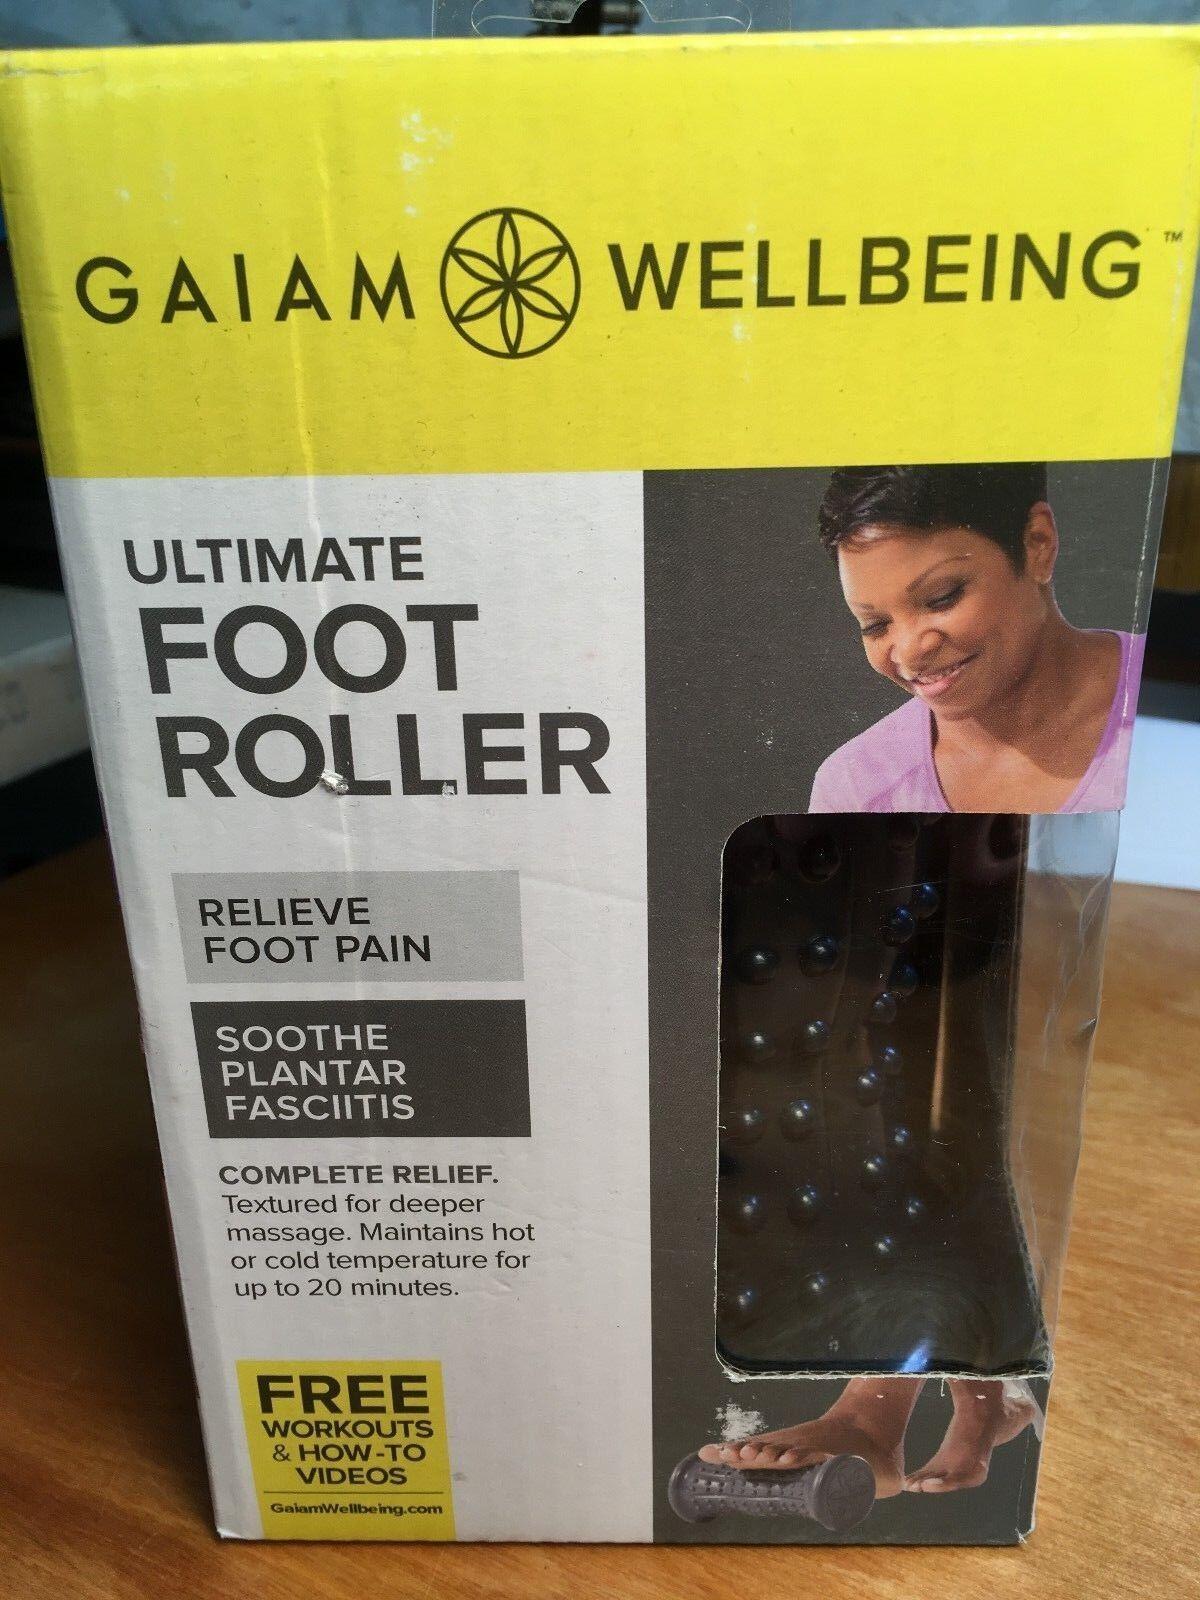 wellbeing ultimate foot roller elimate foot pain